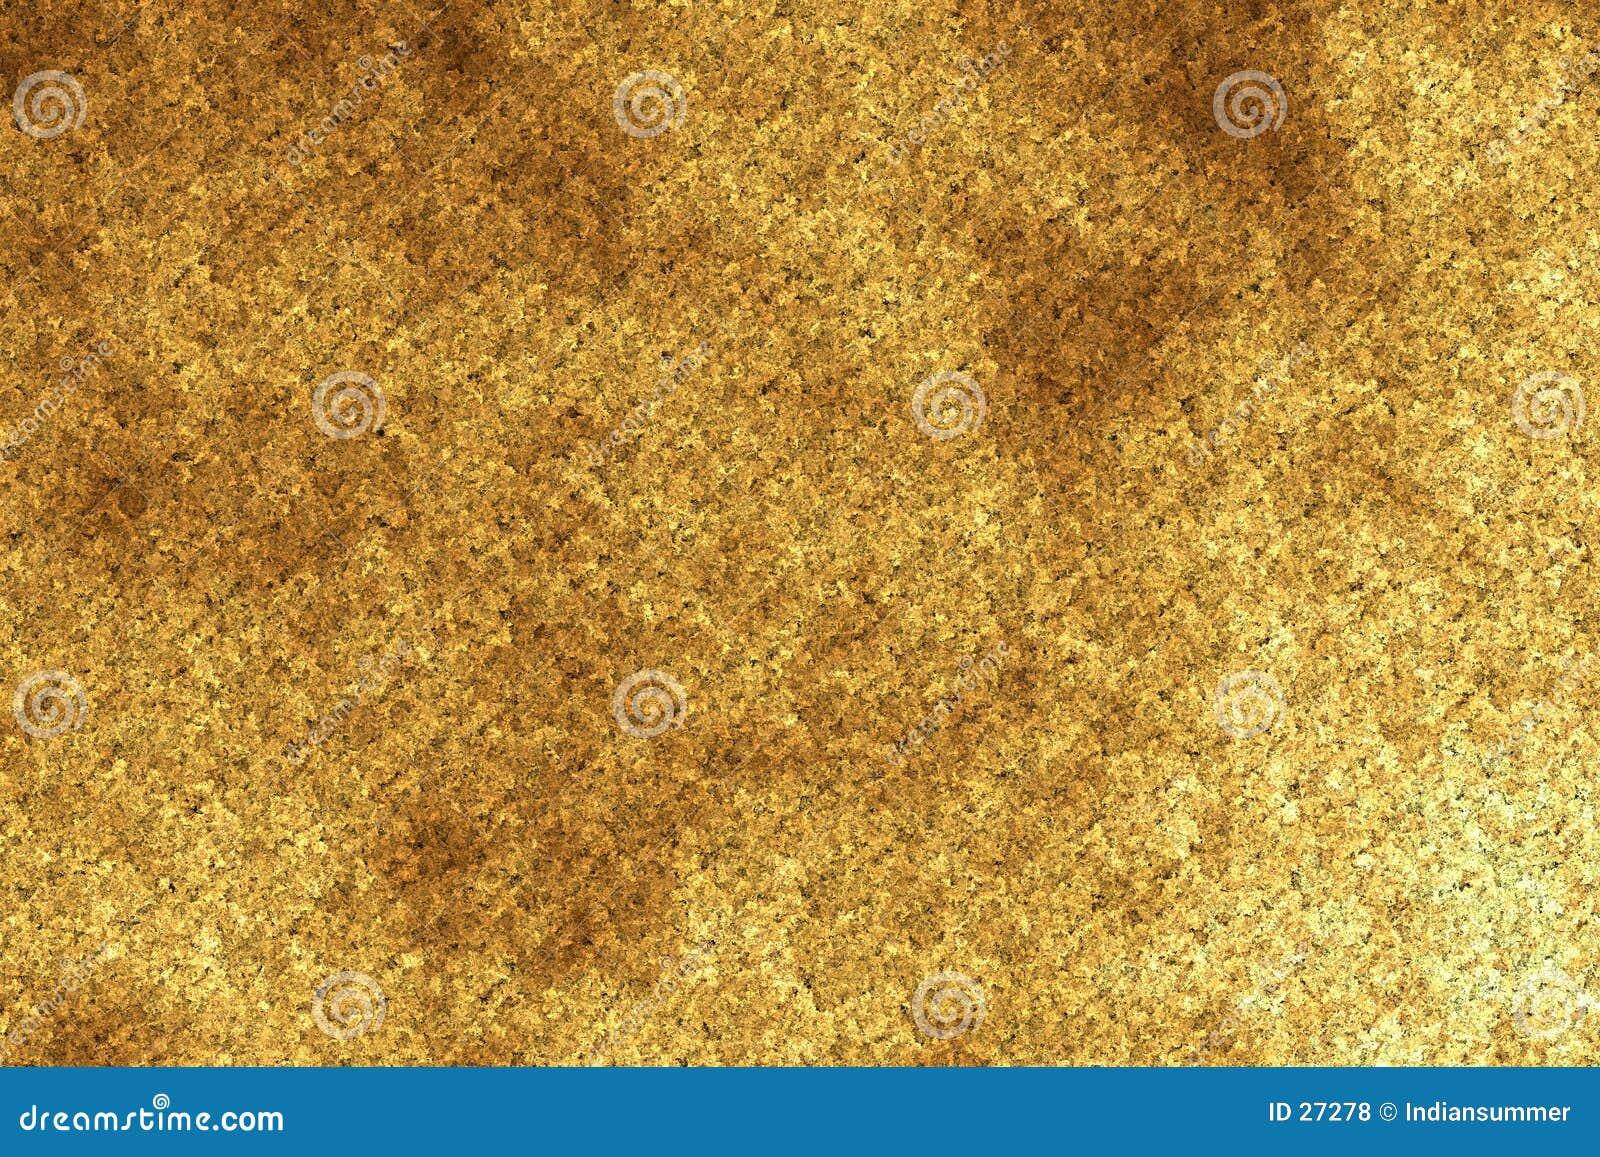 Corky texture II